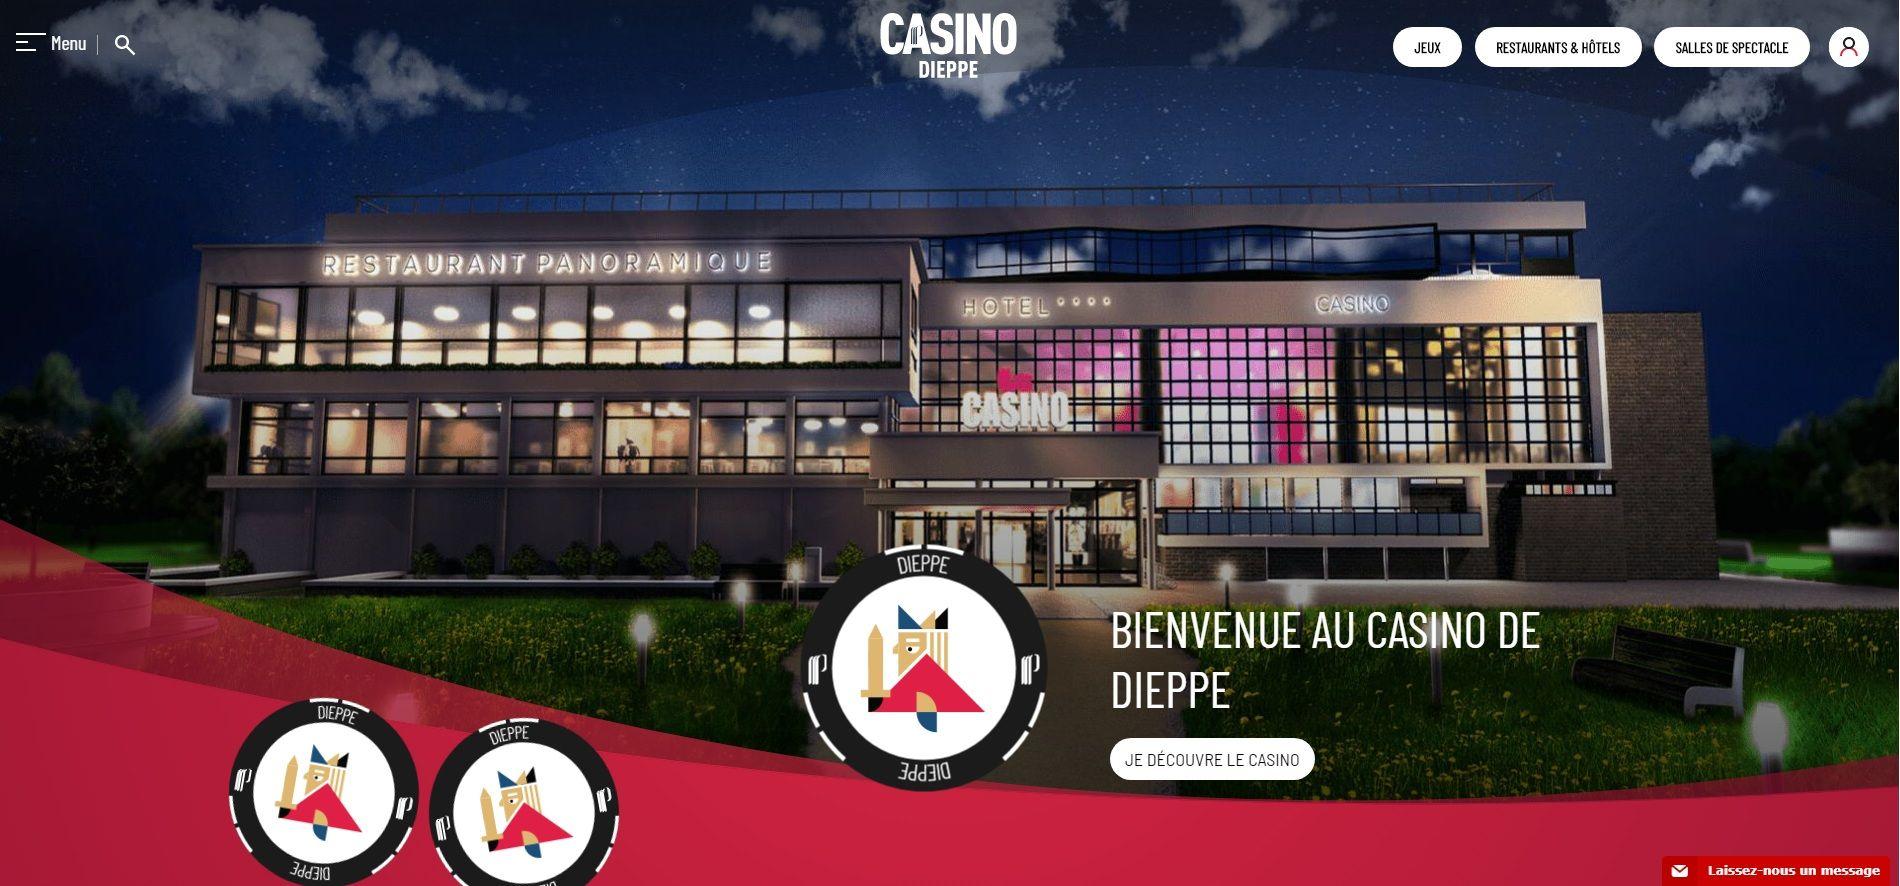 Casino Dieppe avis : la revue casino terrestre !